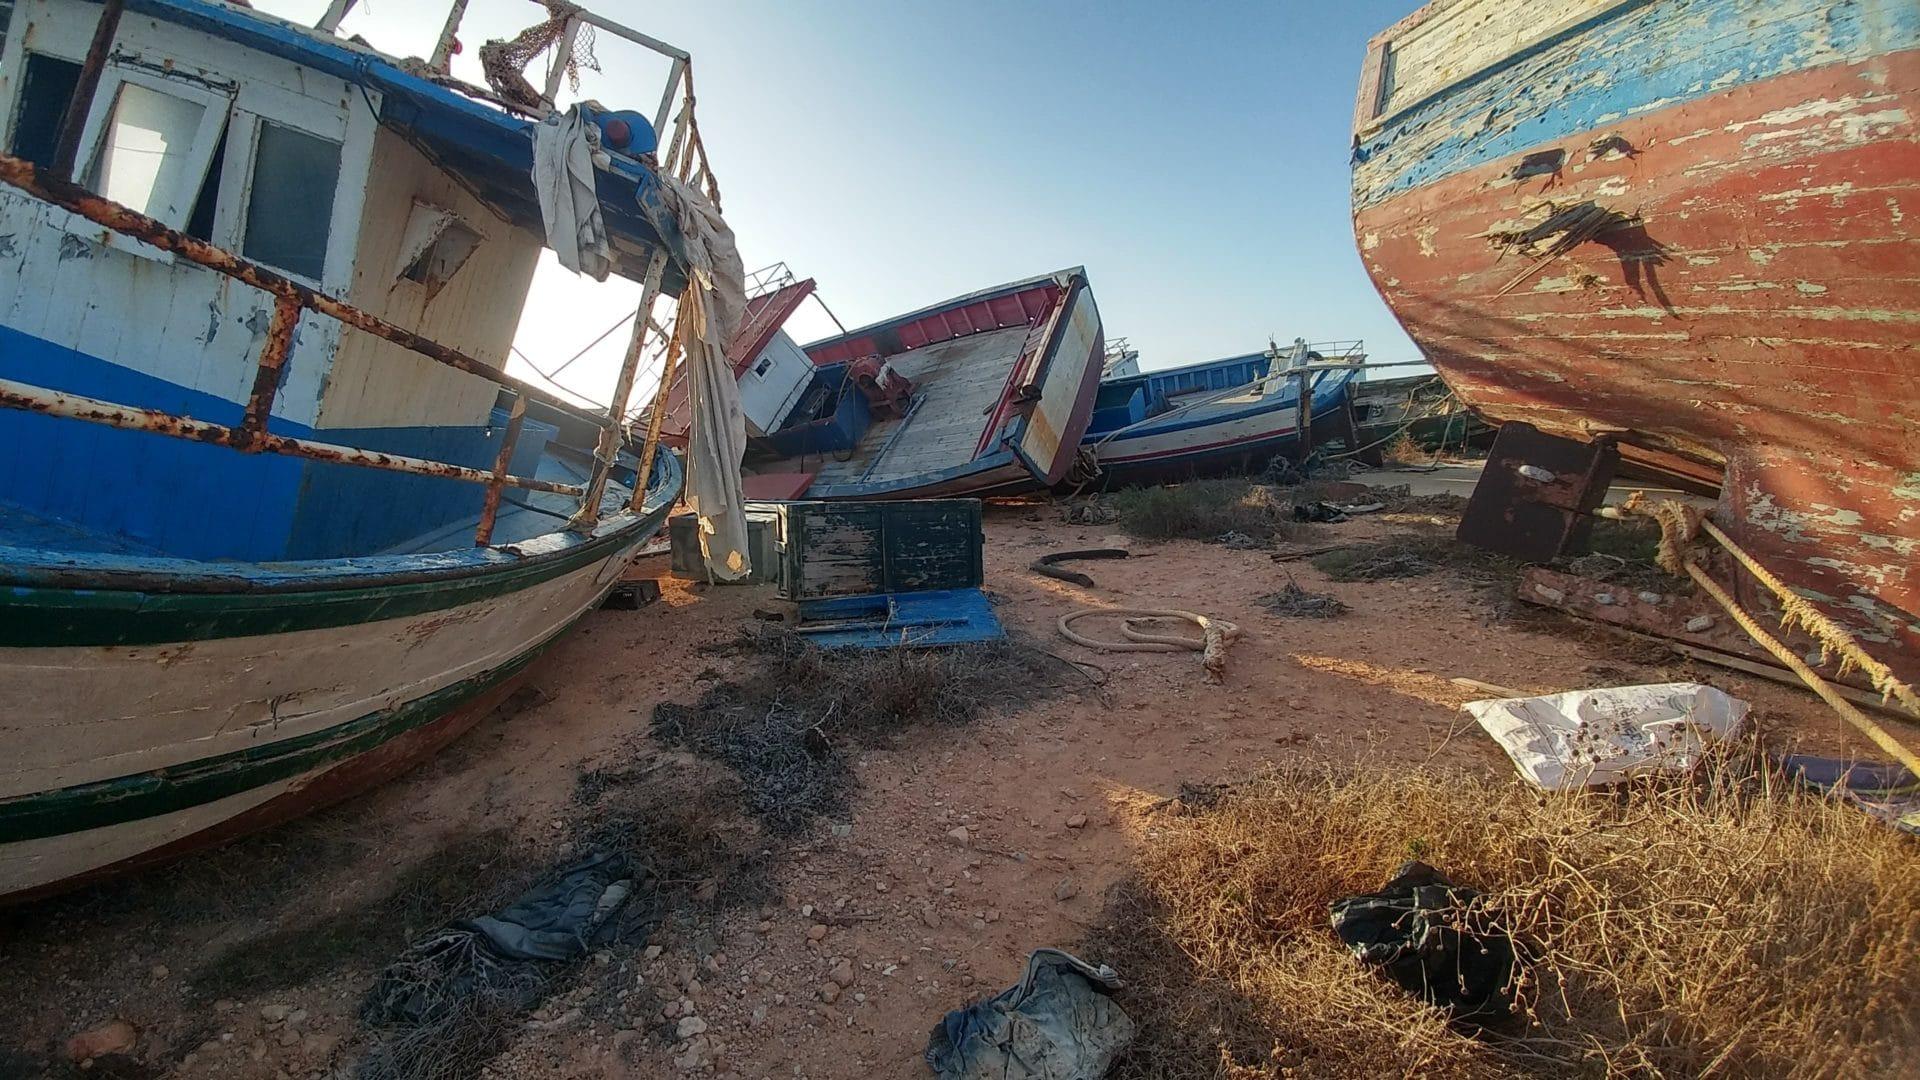 migranti naufragio lampedusa